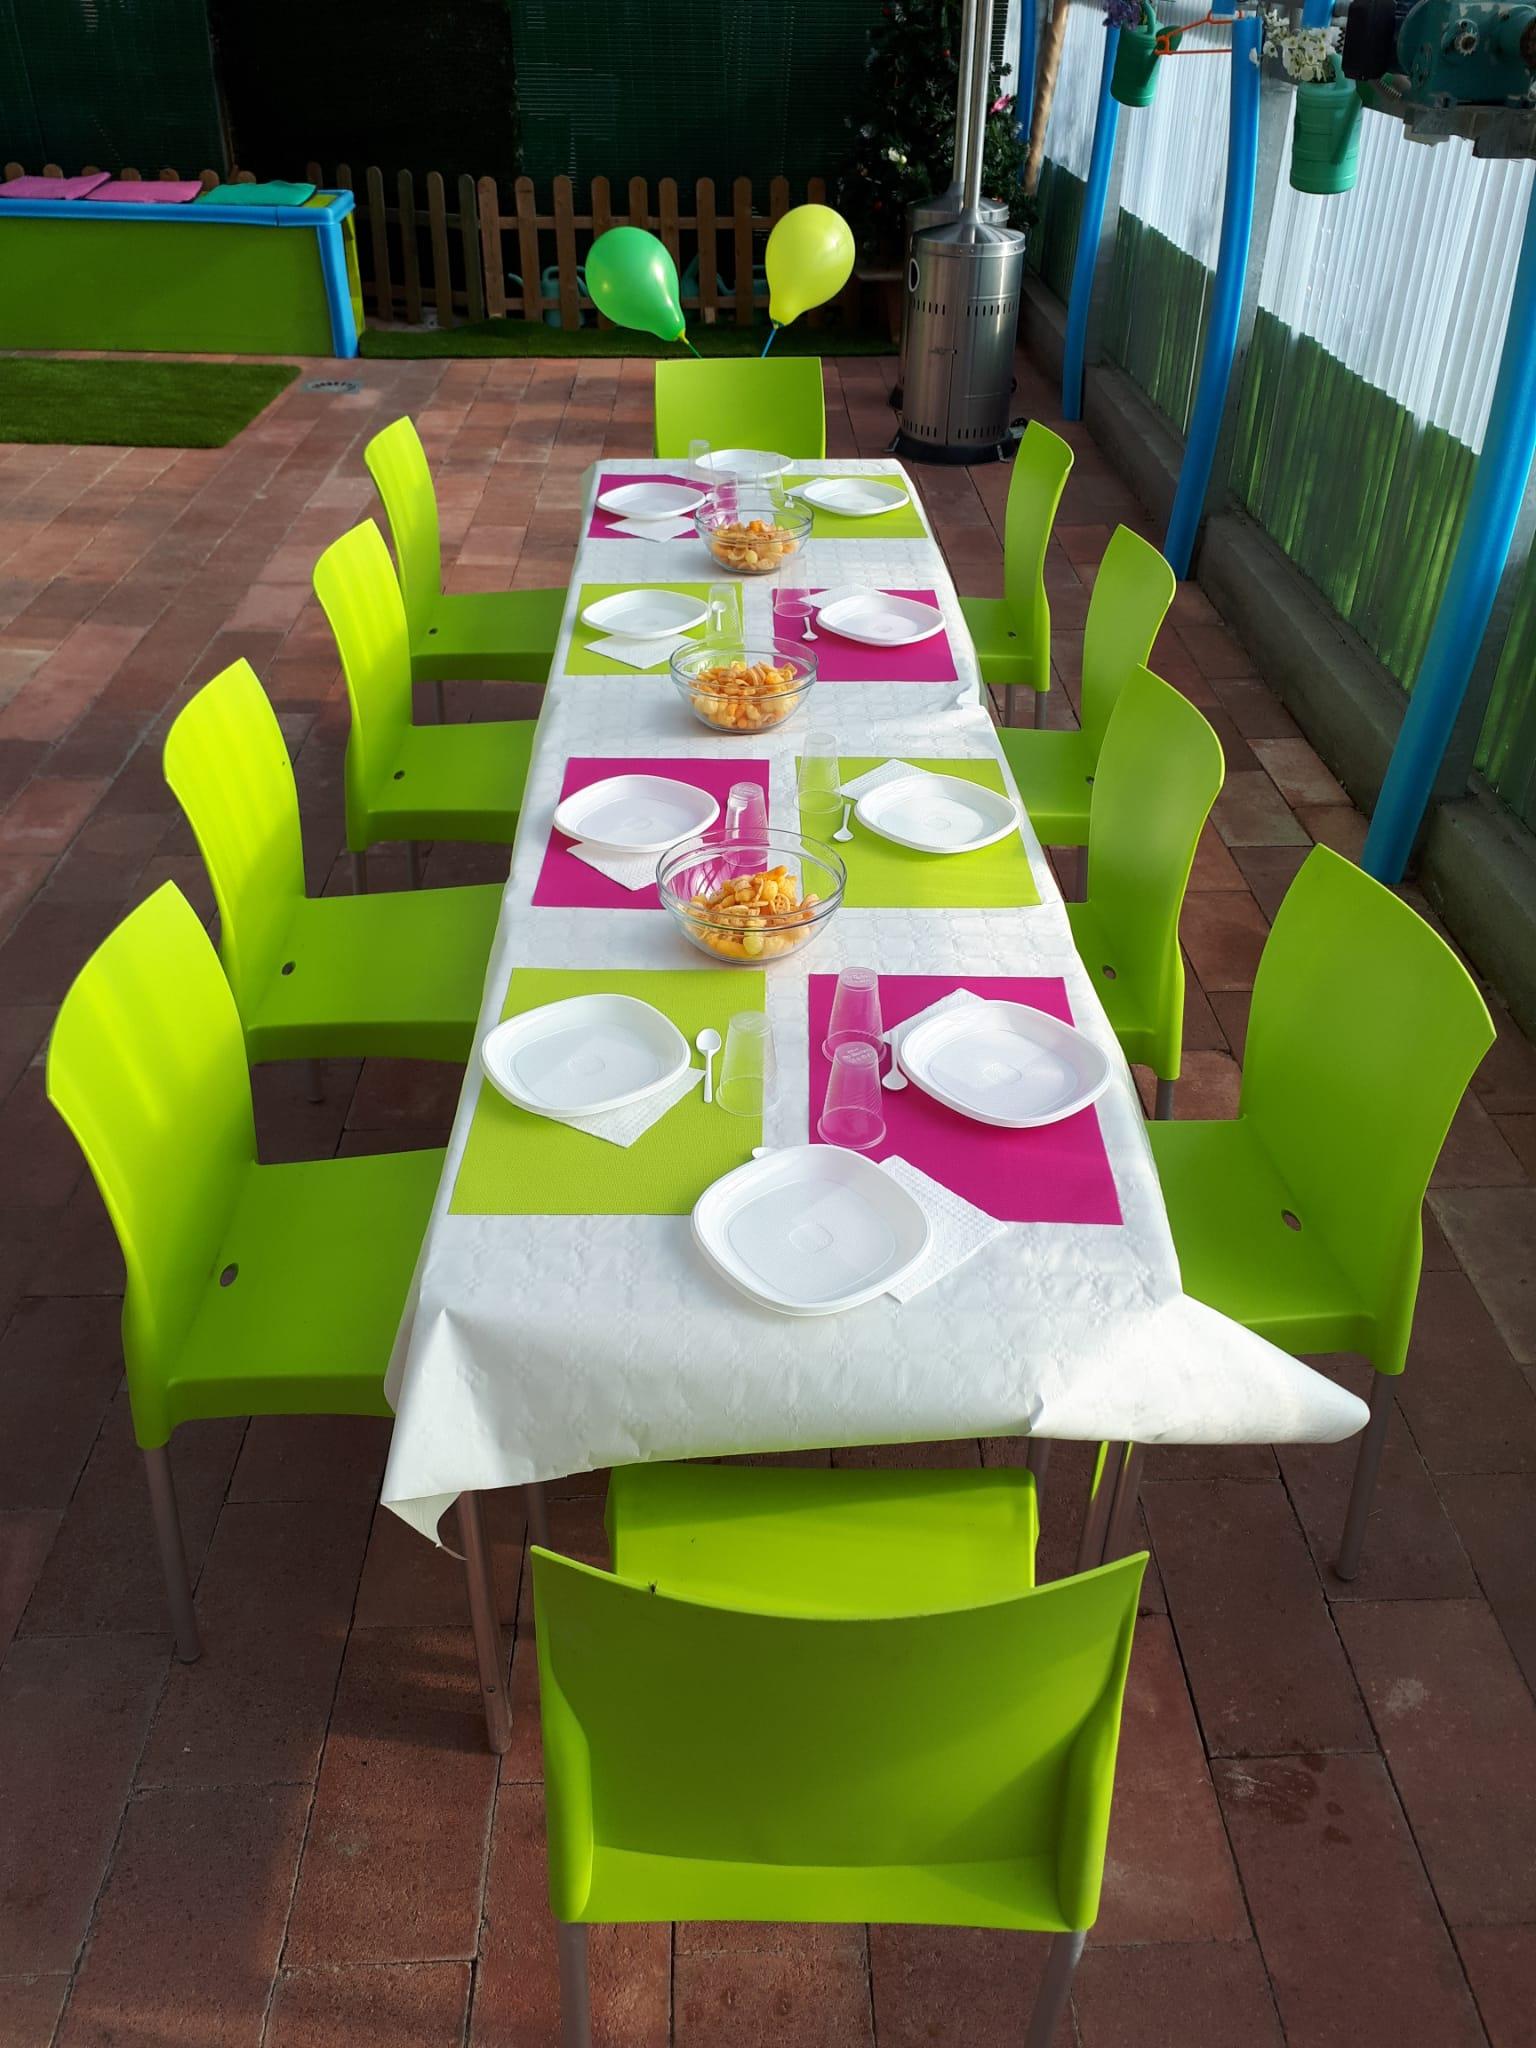 mesa comida - Cumpleaños San Agustín del Guadalix